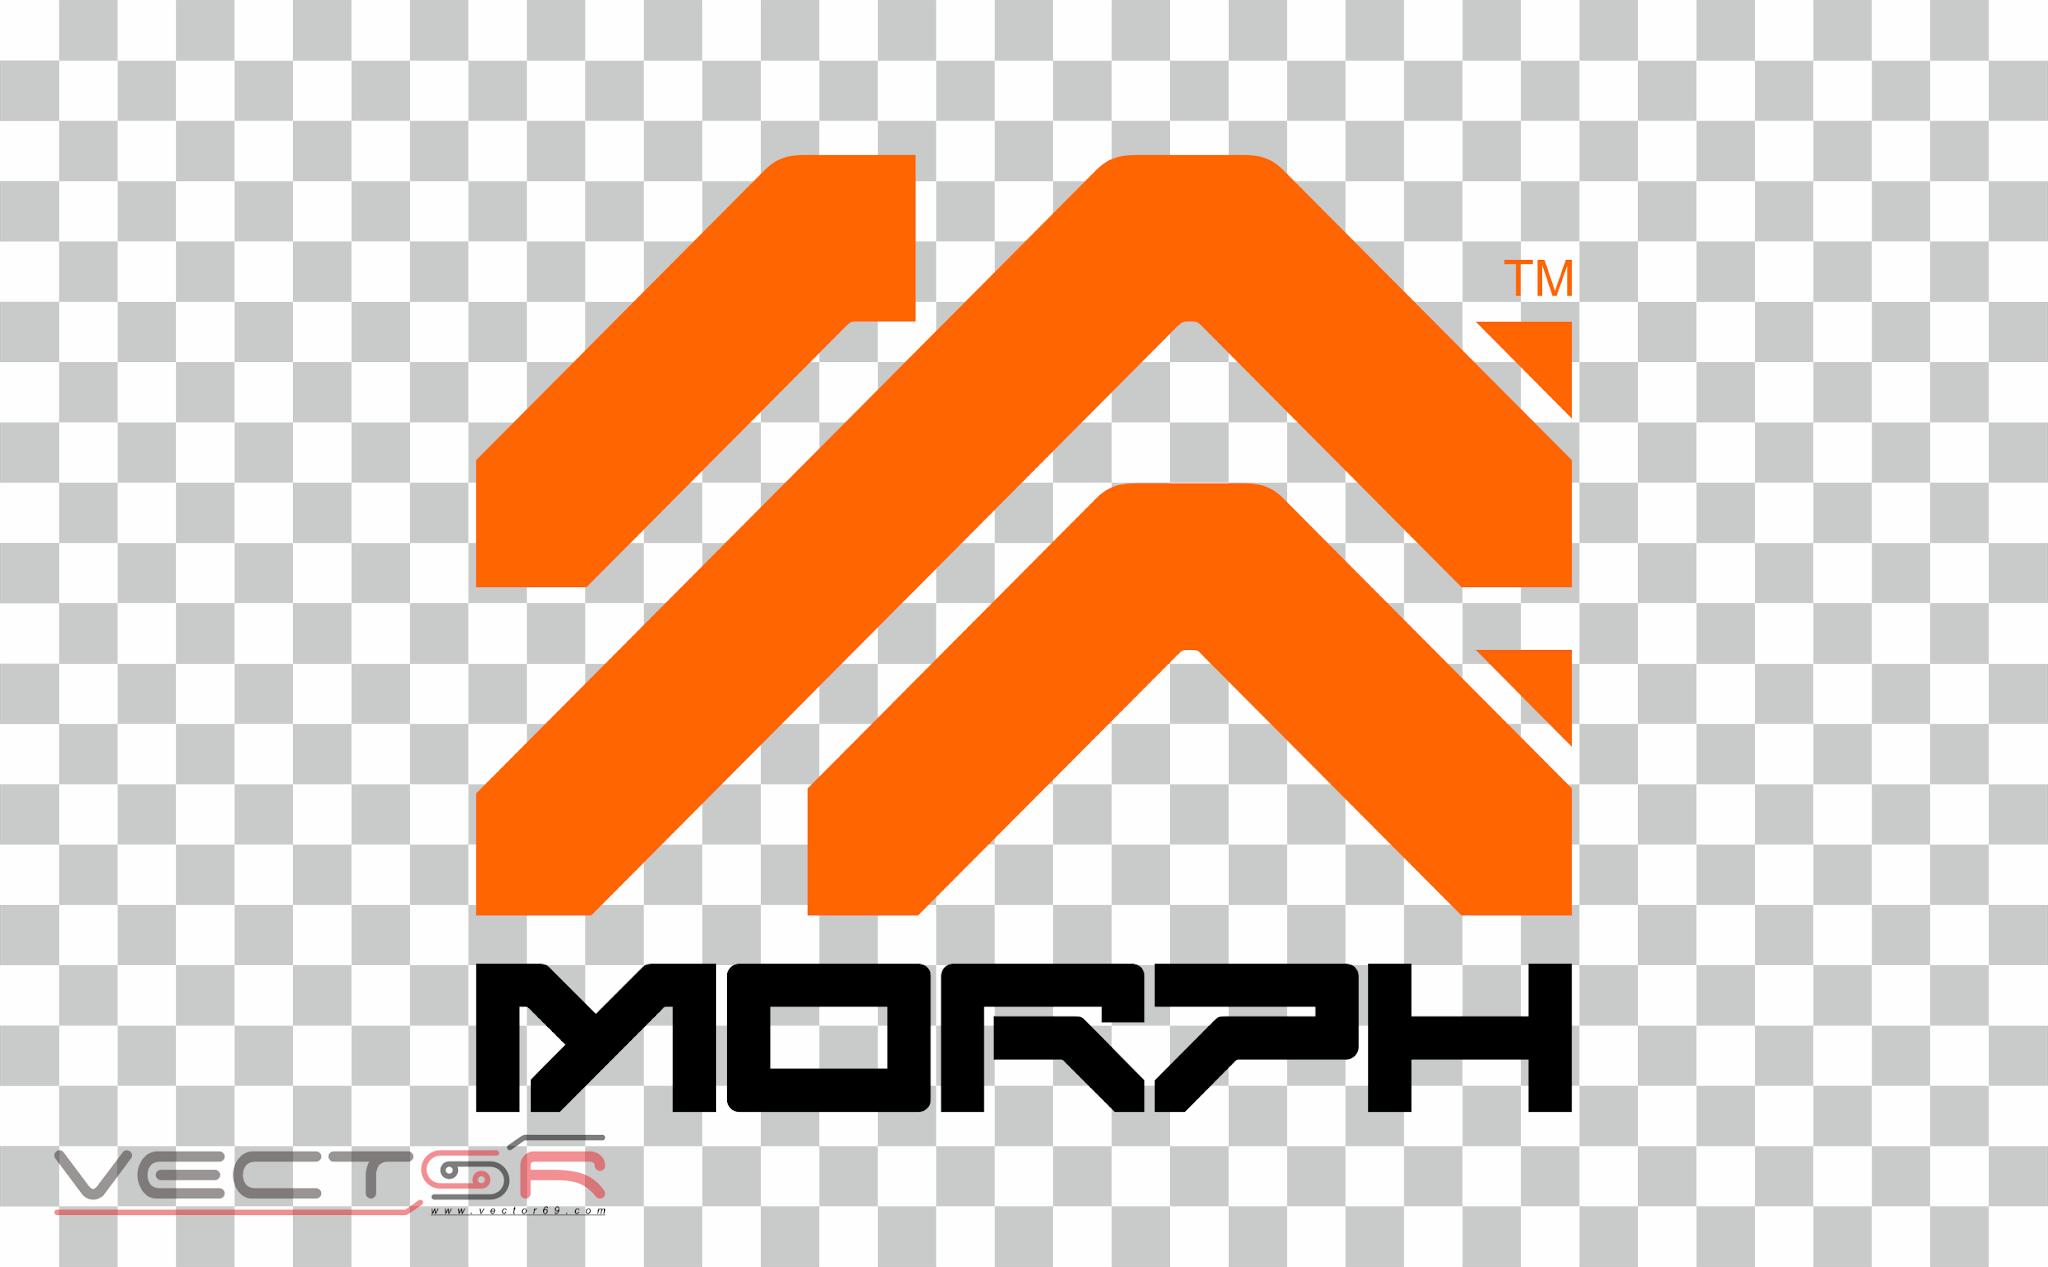 Morph Team Logo - Download Vector File PNG (Portable Network Graphics)